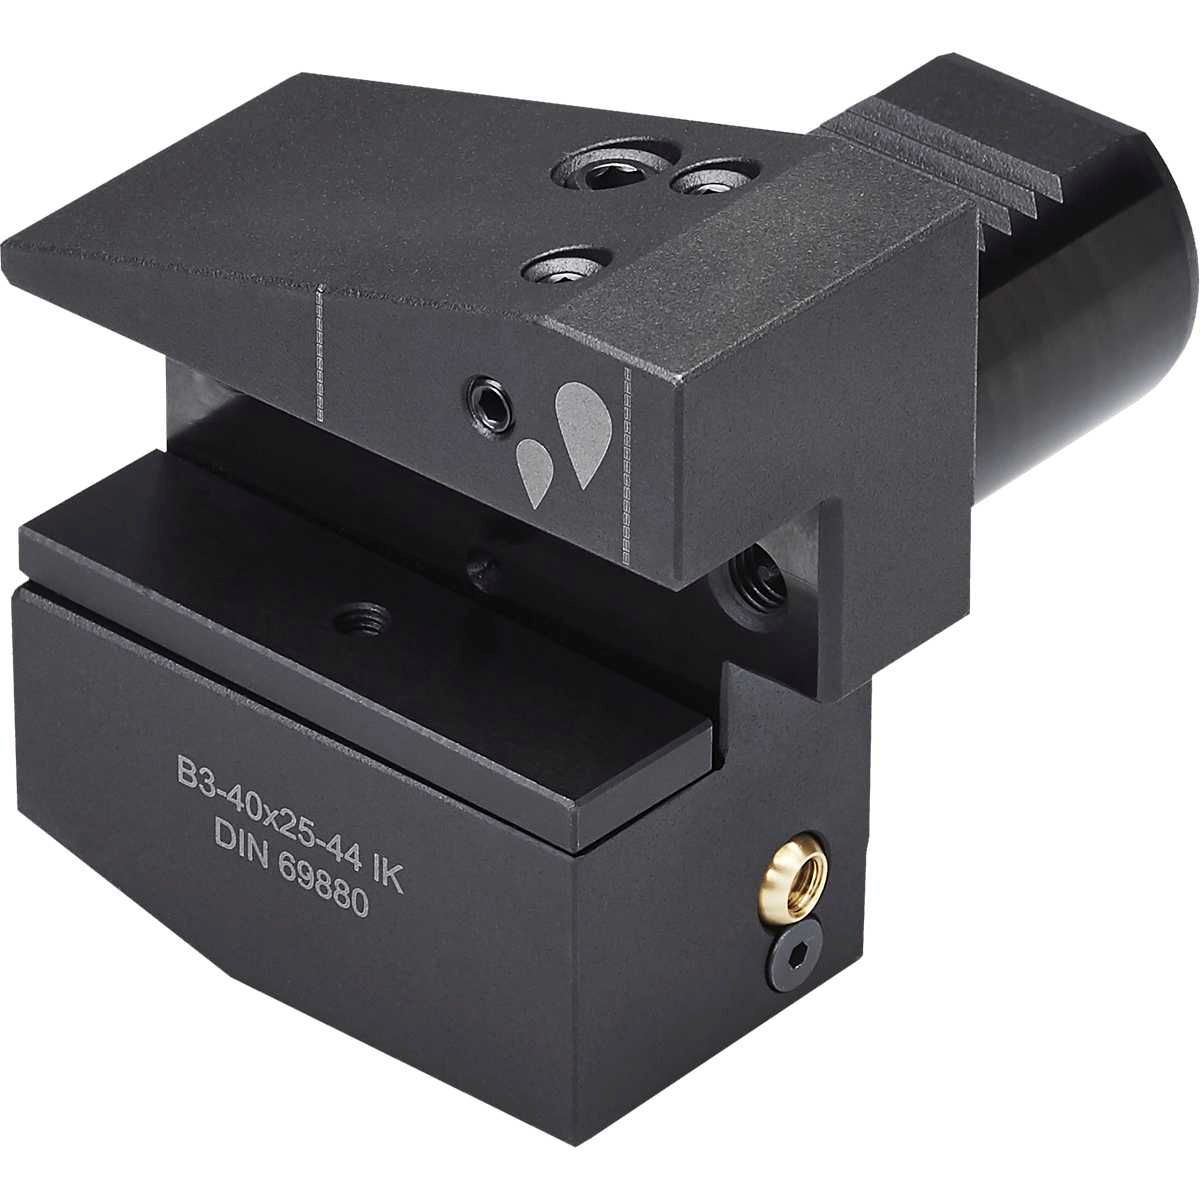 Type B3, radial tool holder, overhead, right-hand, short, IC